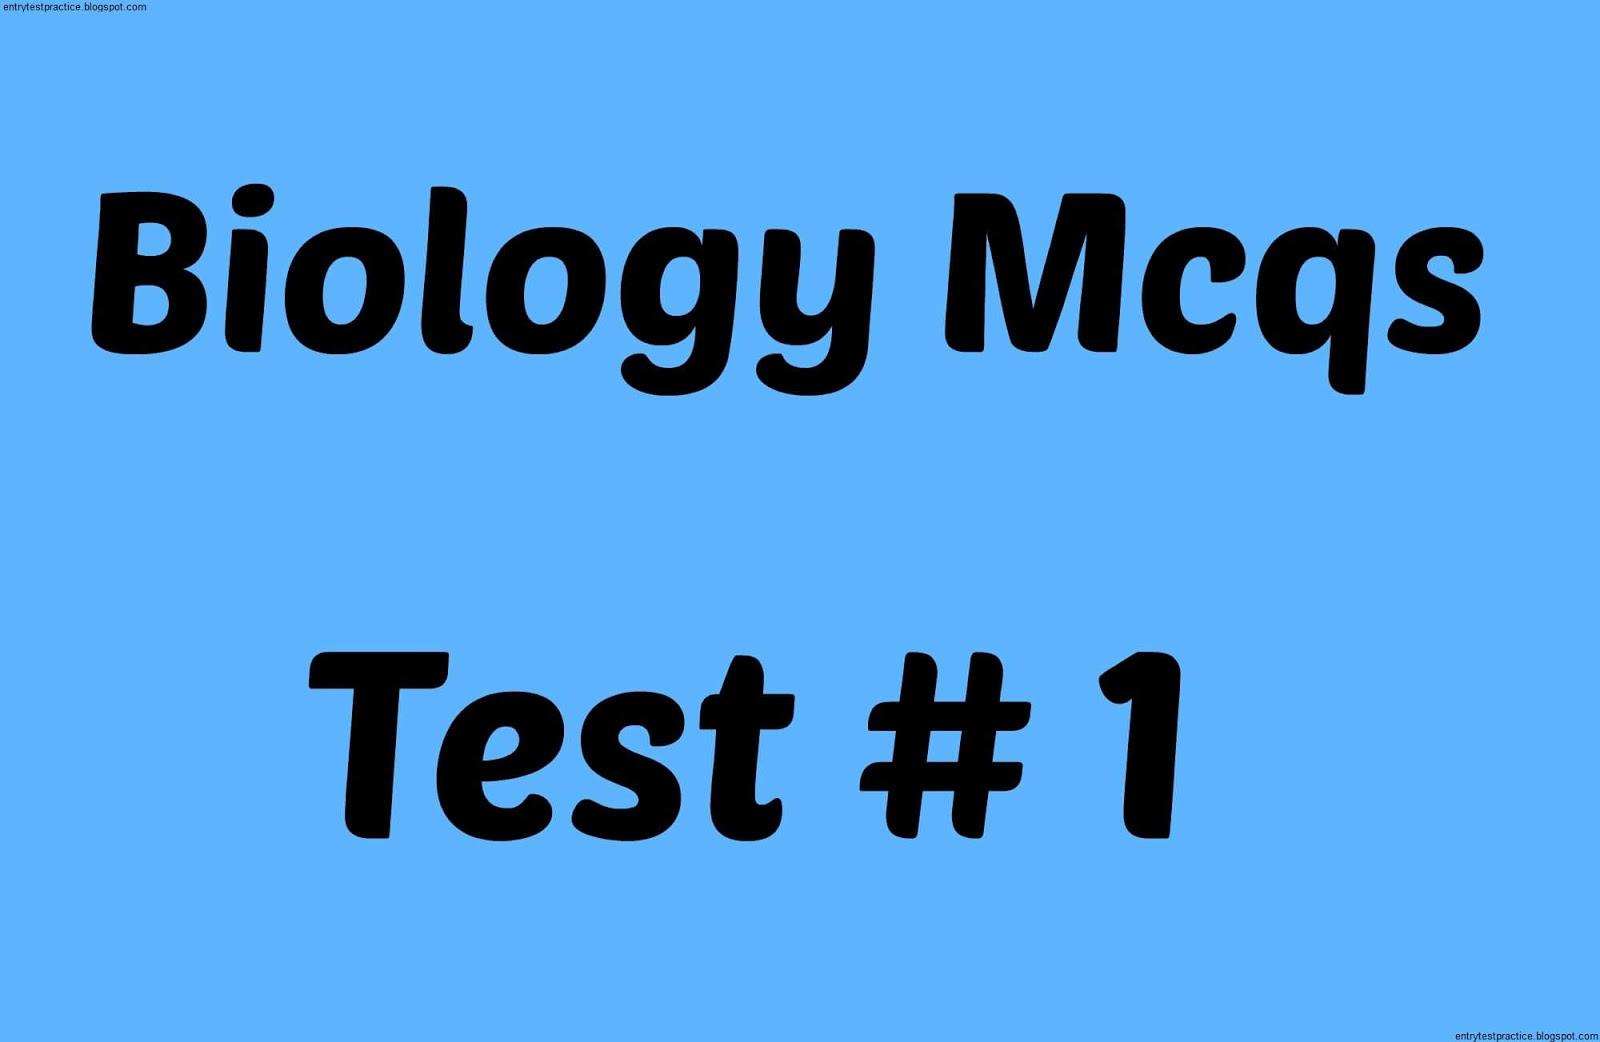 Biology Mcqs test No 1 - Entry test practice